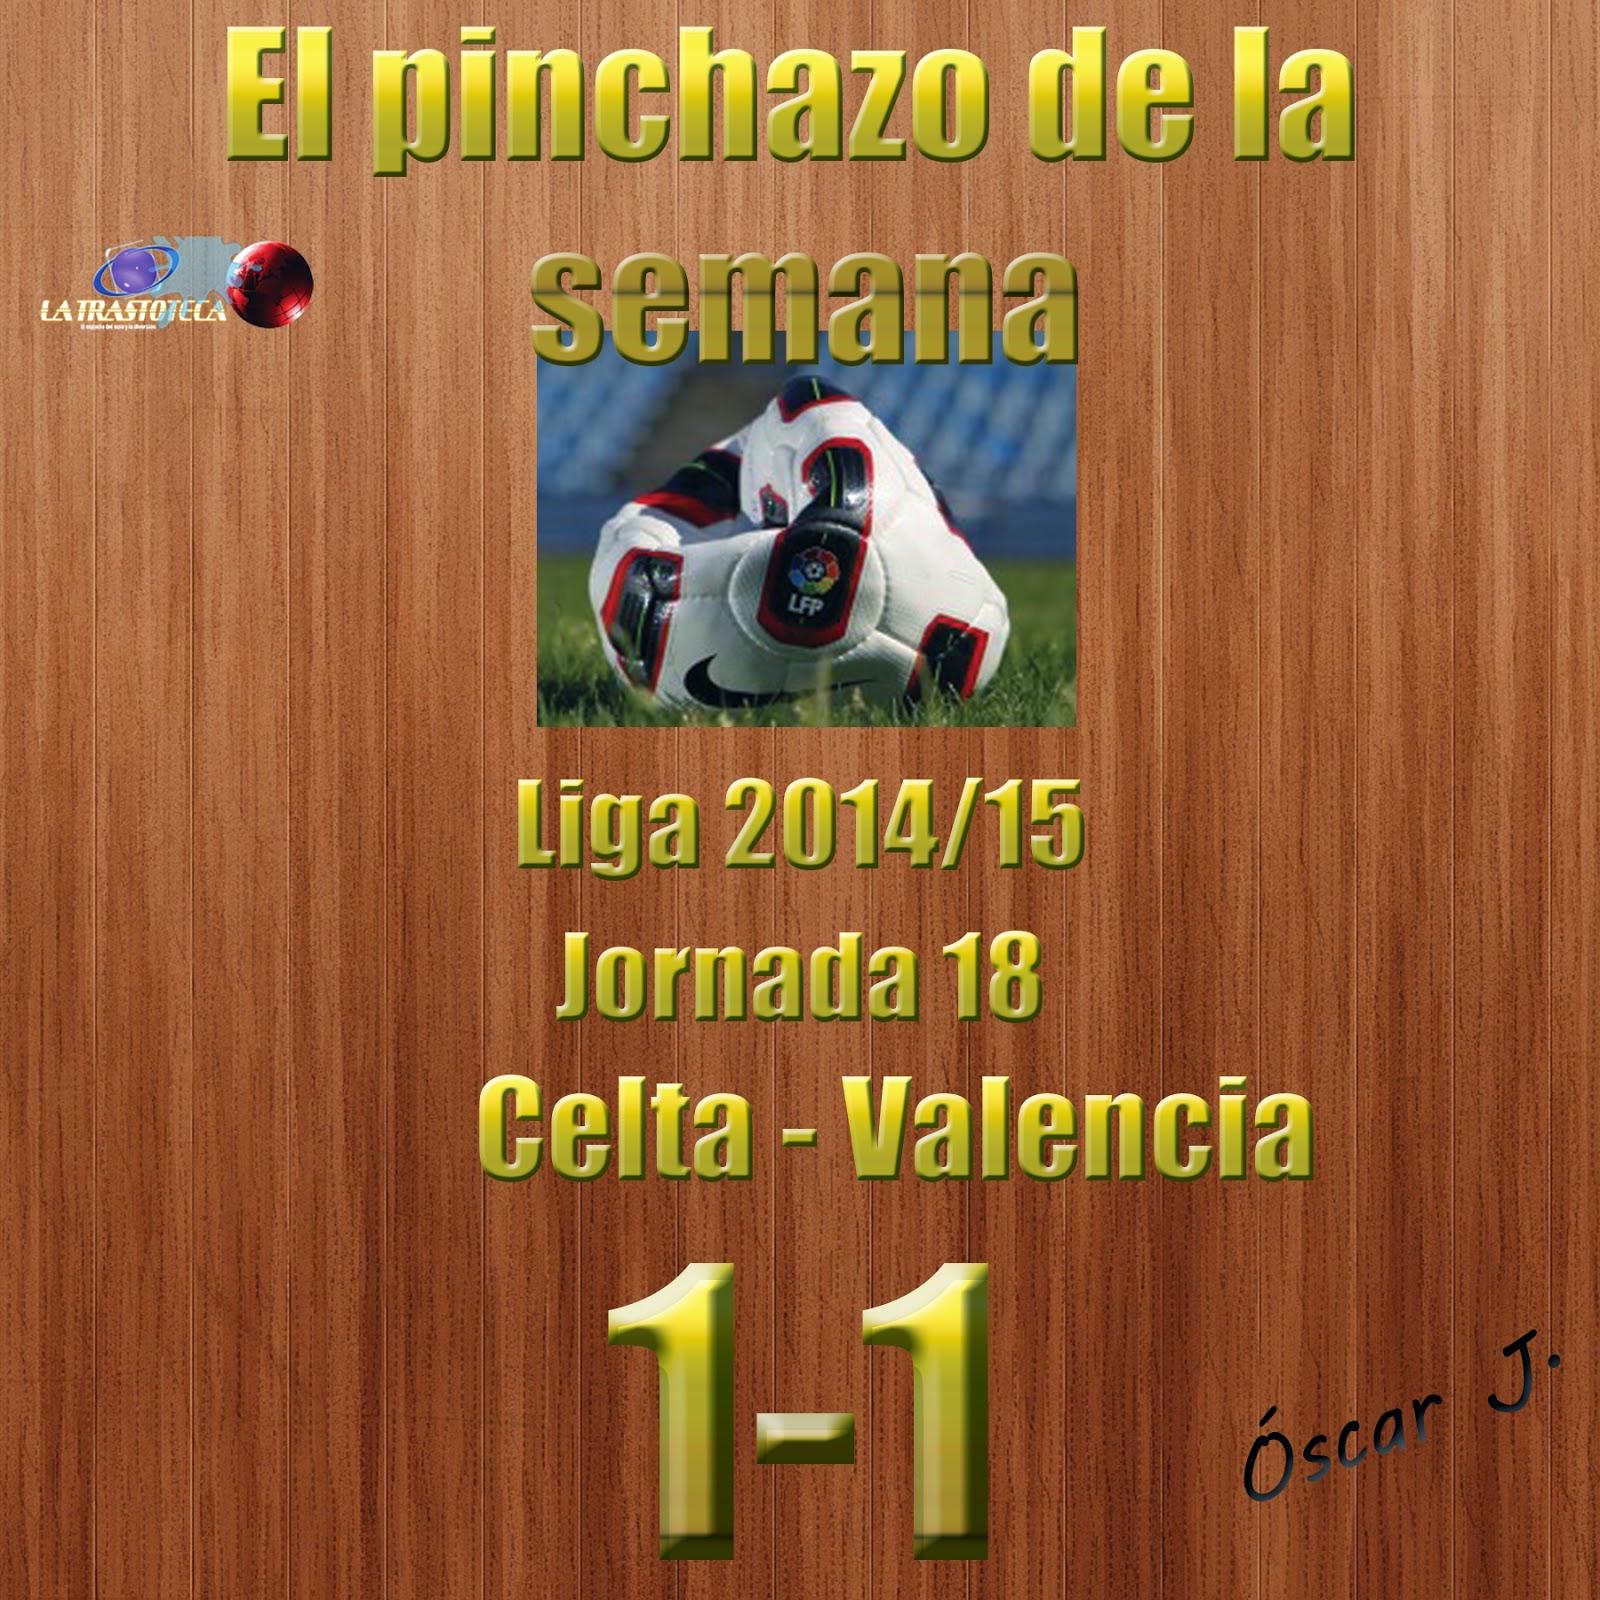 Celta 1-1 Valencia. Liga 2014/15 - Jornada 18. El pinchazo de la semana.